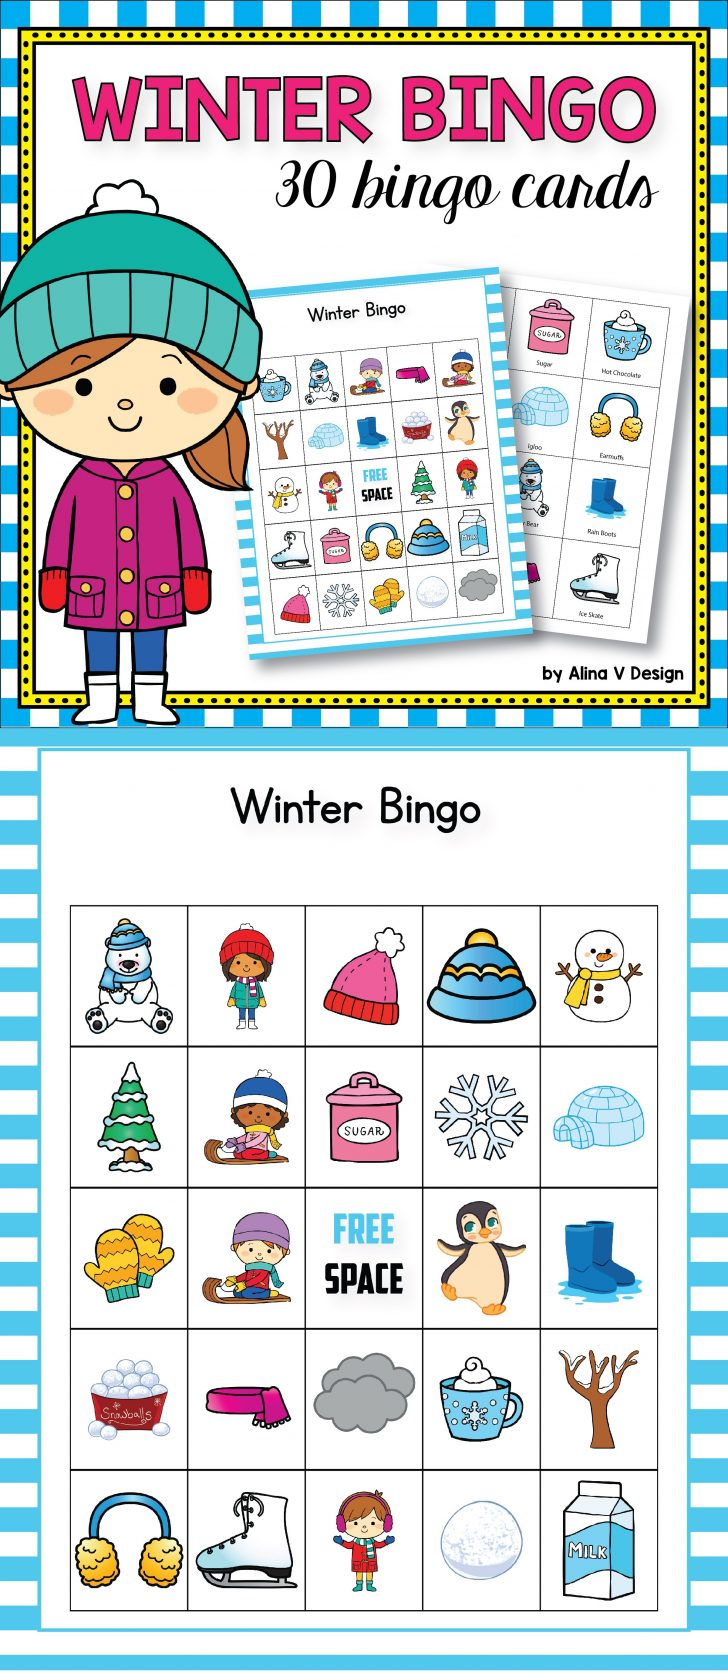 Free Winter Bingo Printable Cards